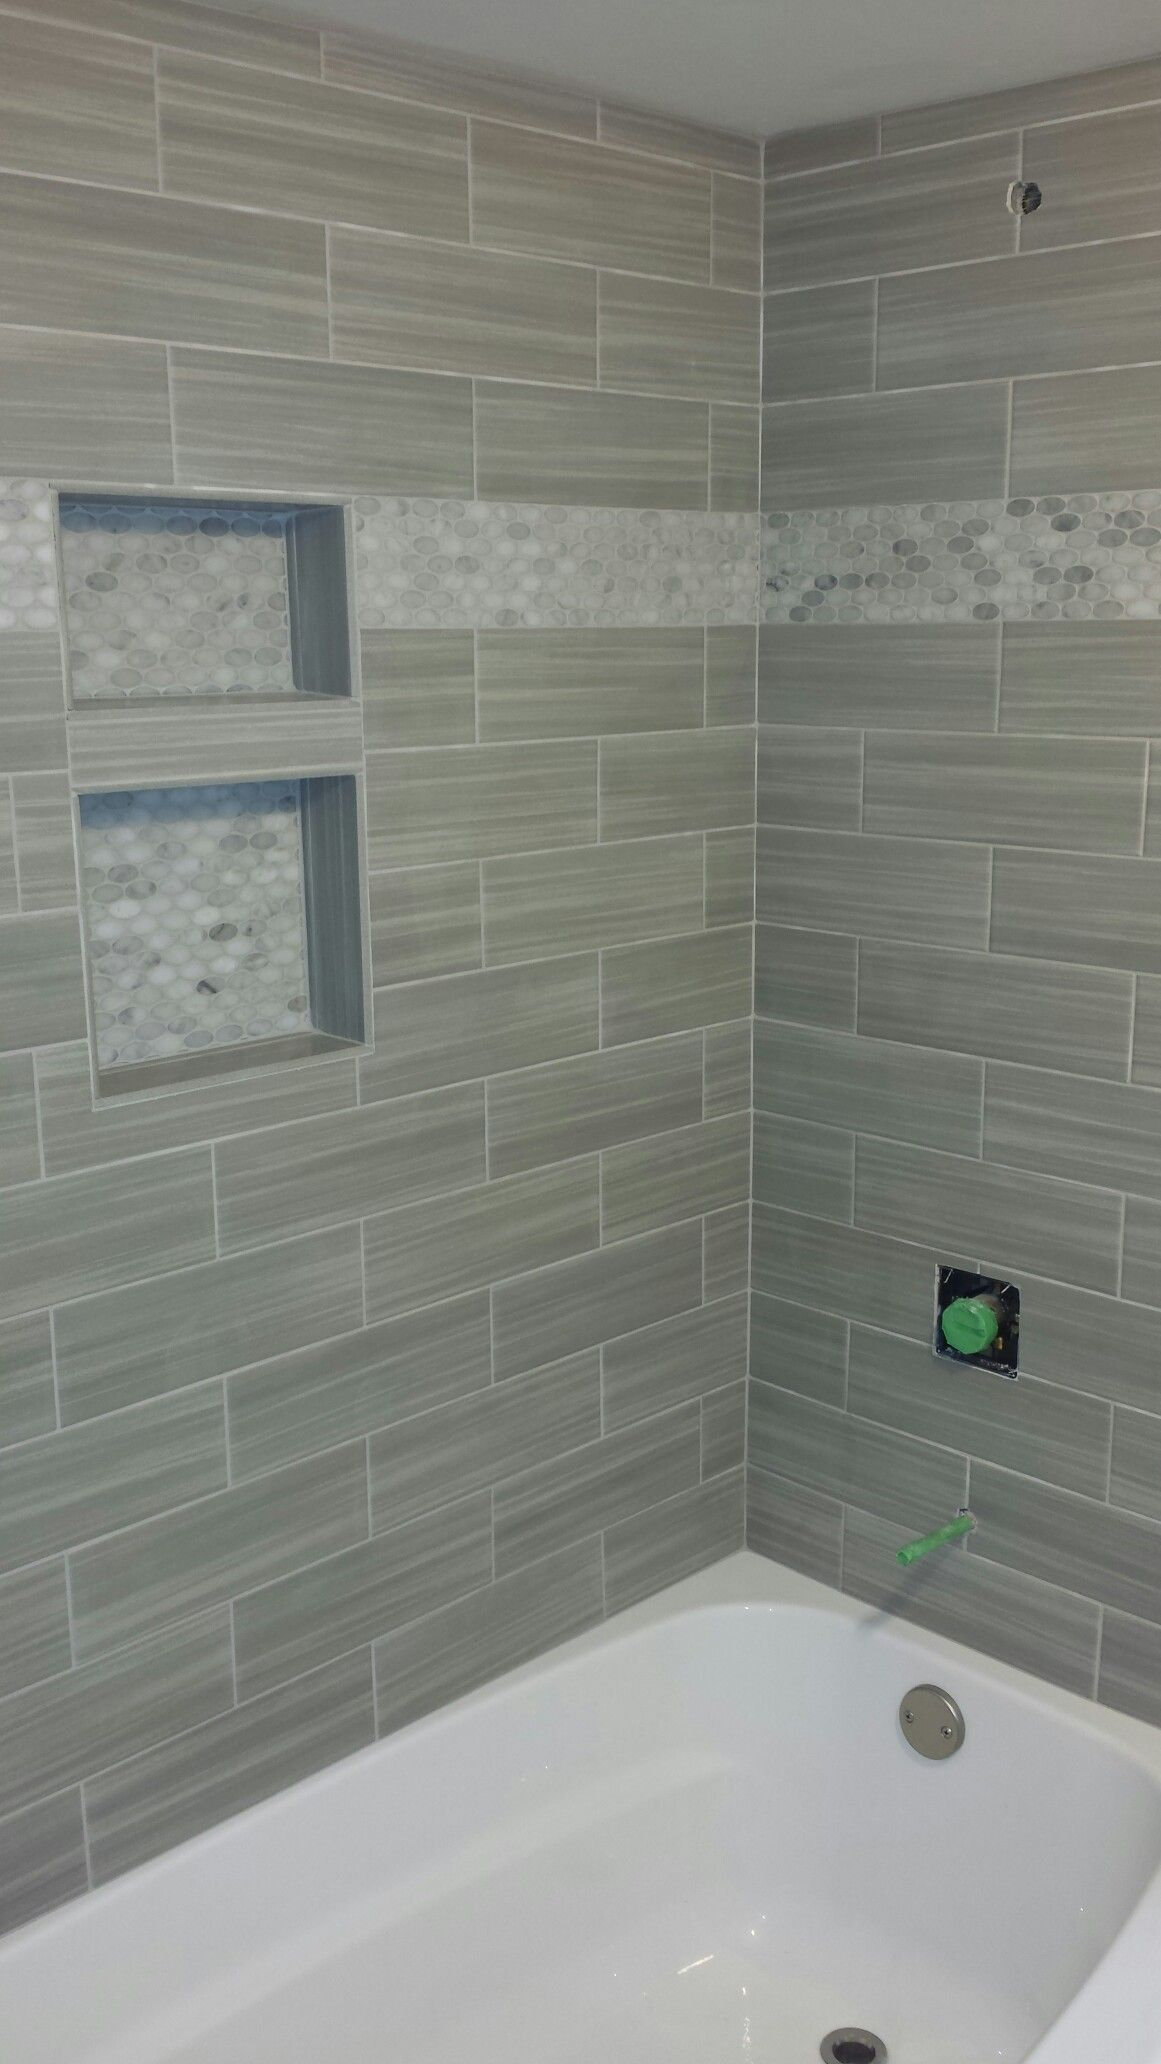 White Subway Tile With Mosaic Border   Tile Design Ideas